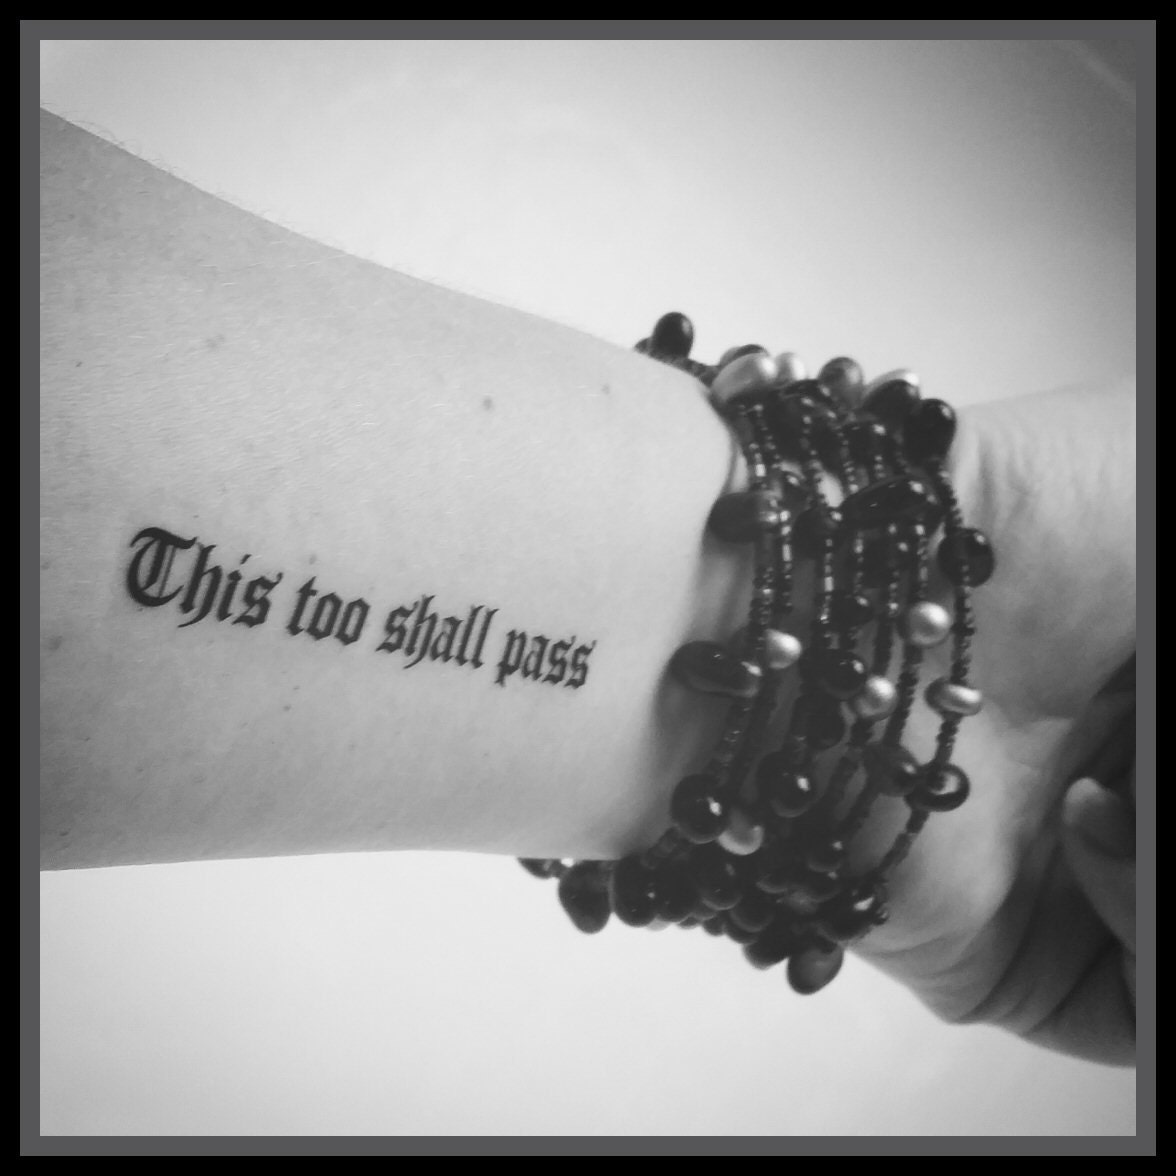 Quote tattoo Temporary tattoo fake tattoo quote tattoo this   Etsy